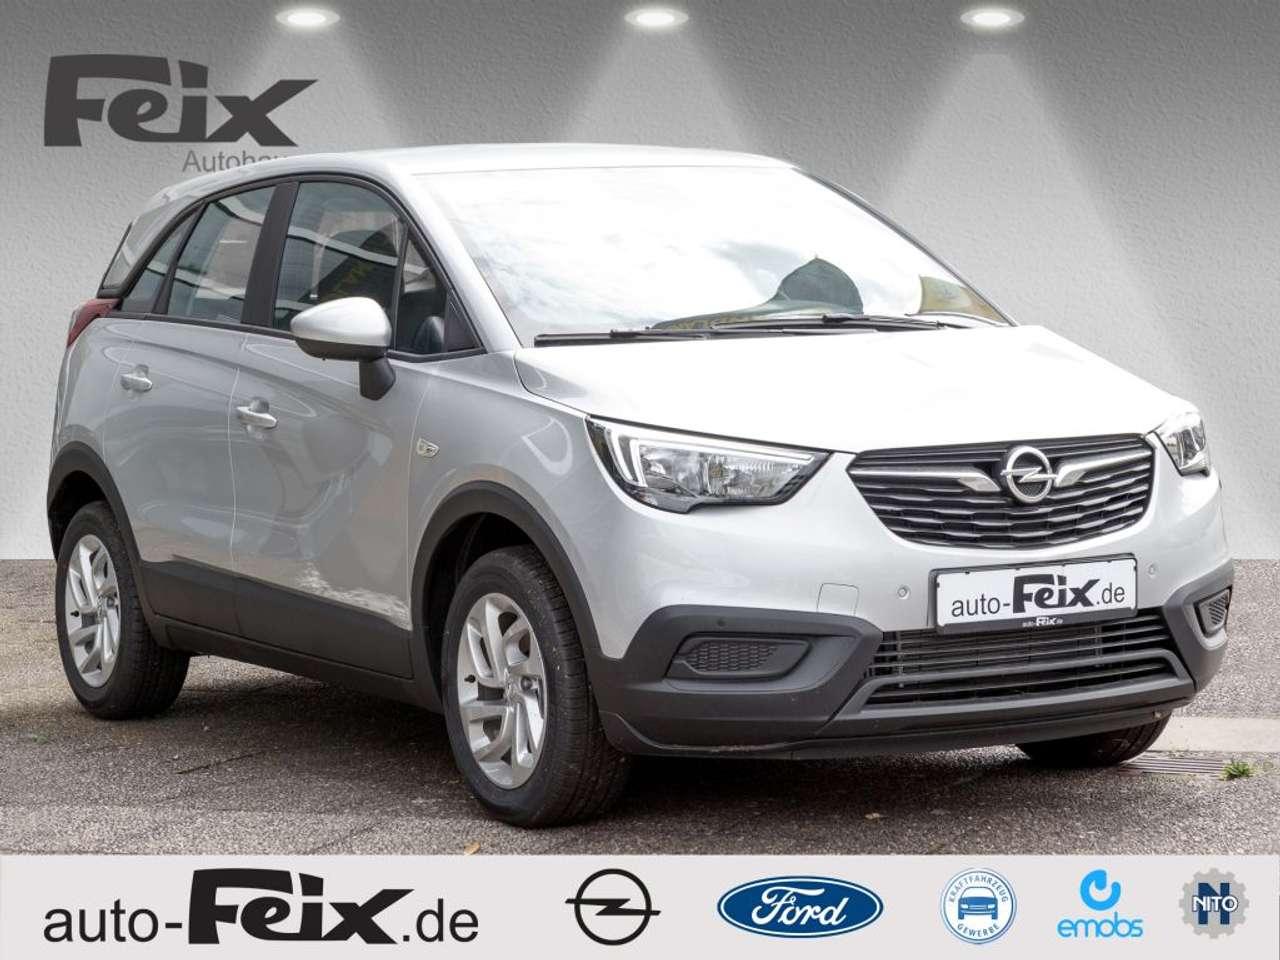 Autos nach Opel Crossland X 1.2 DI Turbo